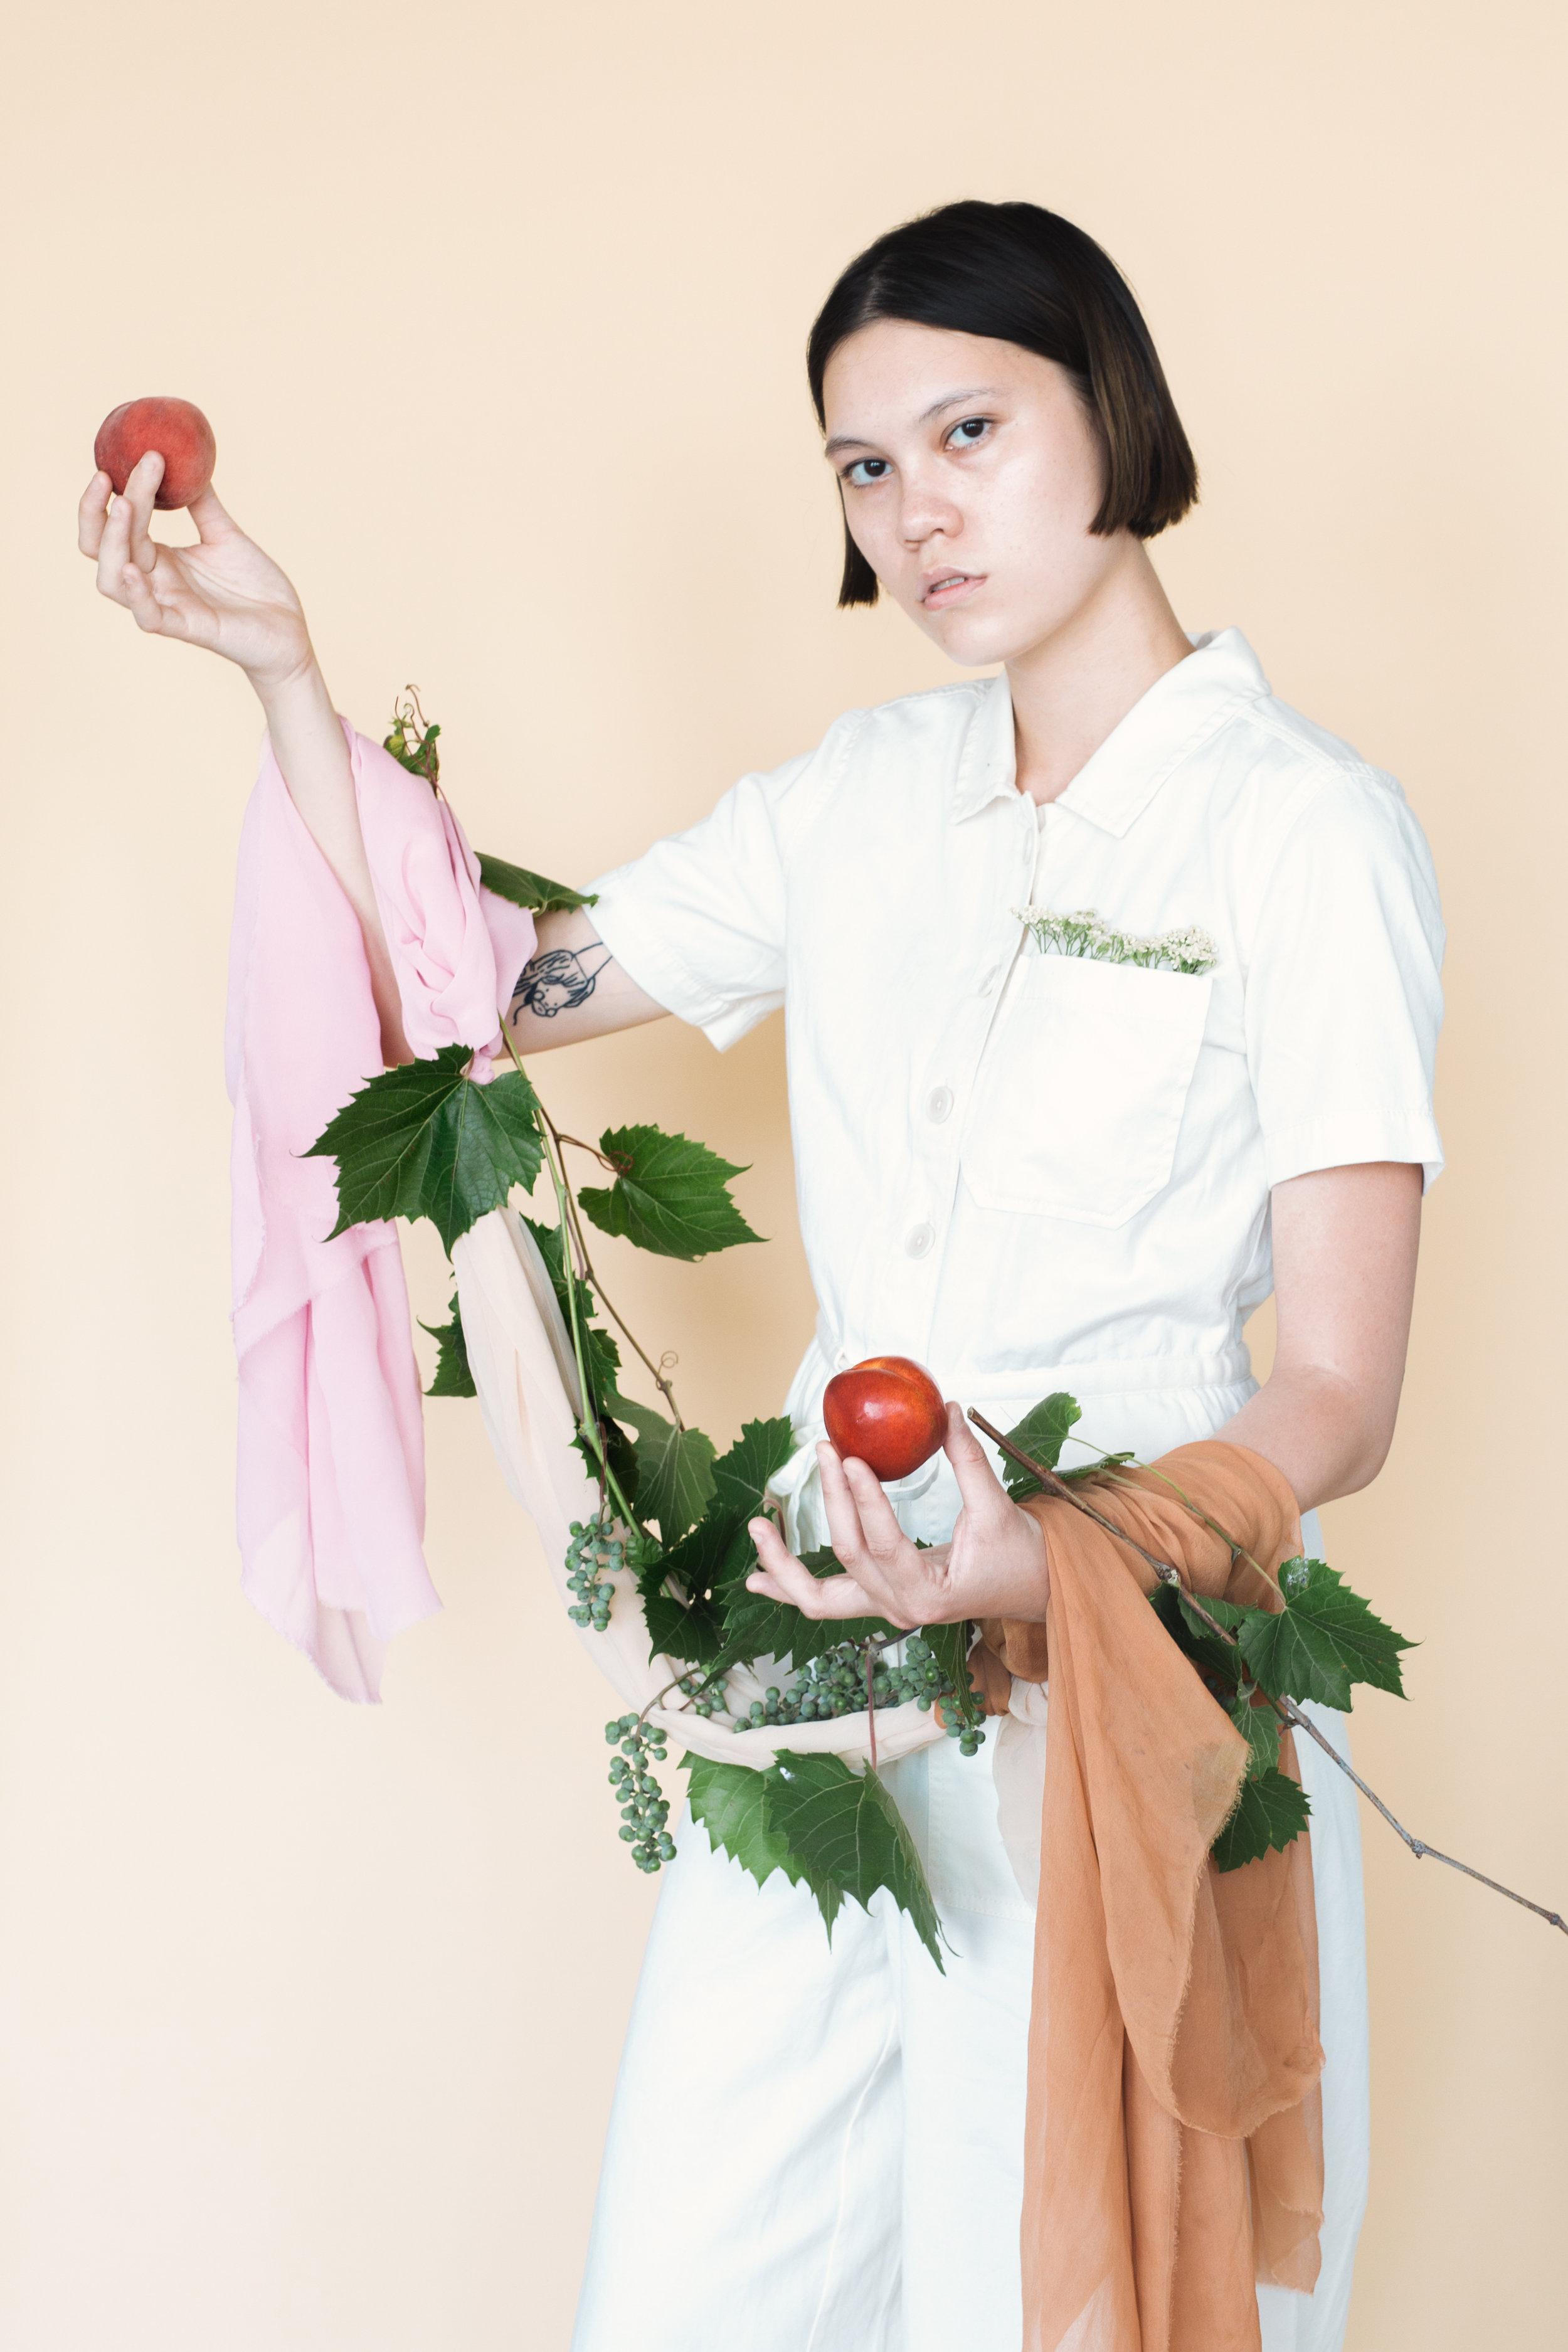 rosemarine-textiles-stone-fruit-grape-vine.jpg